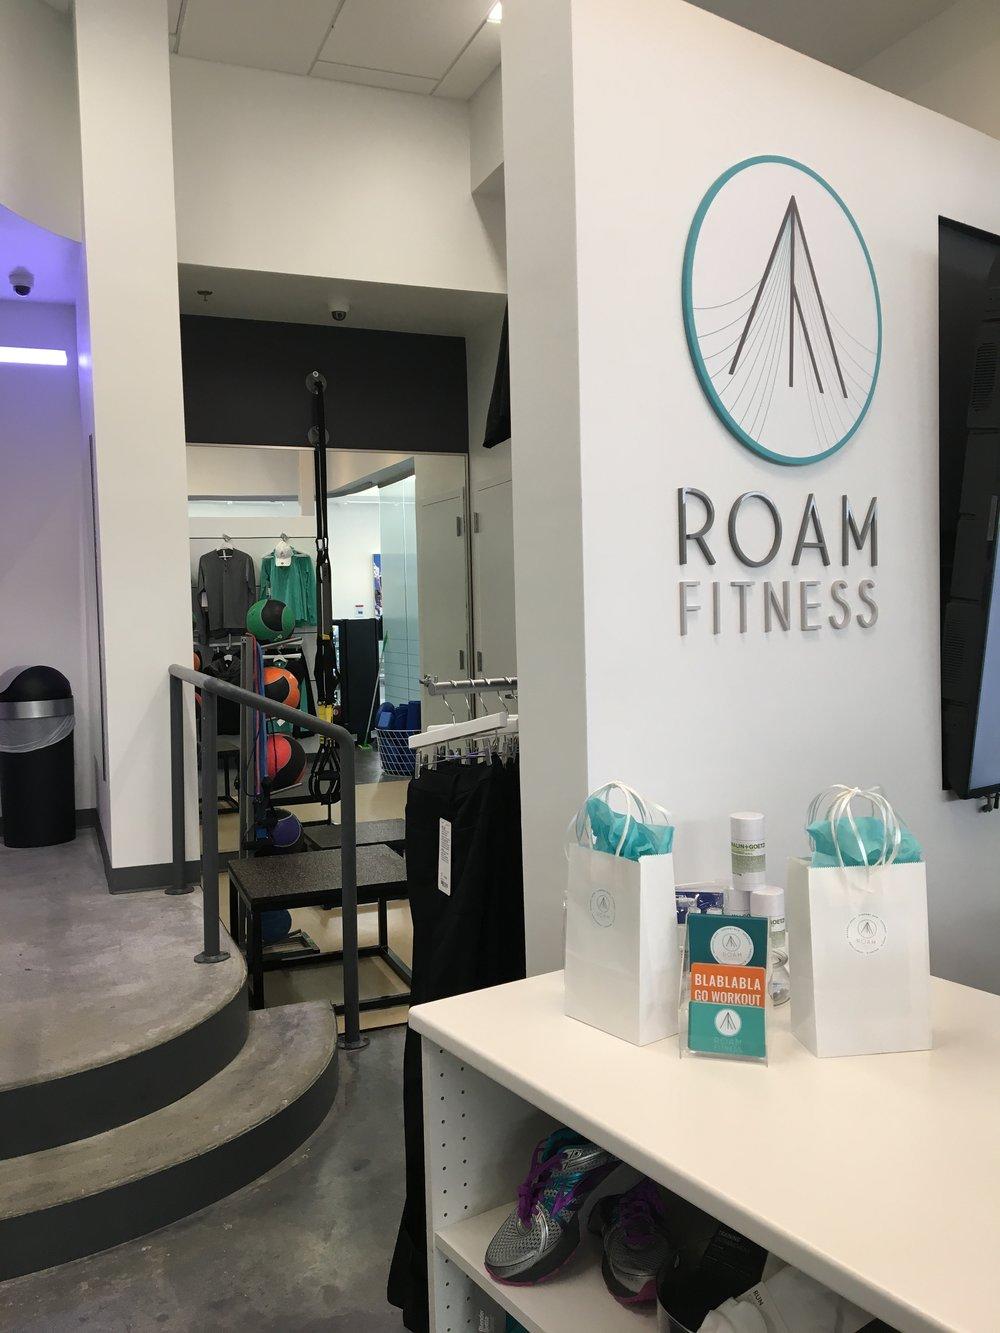 ROAM Fitness